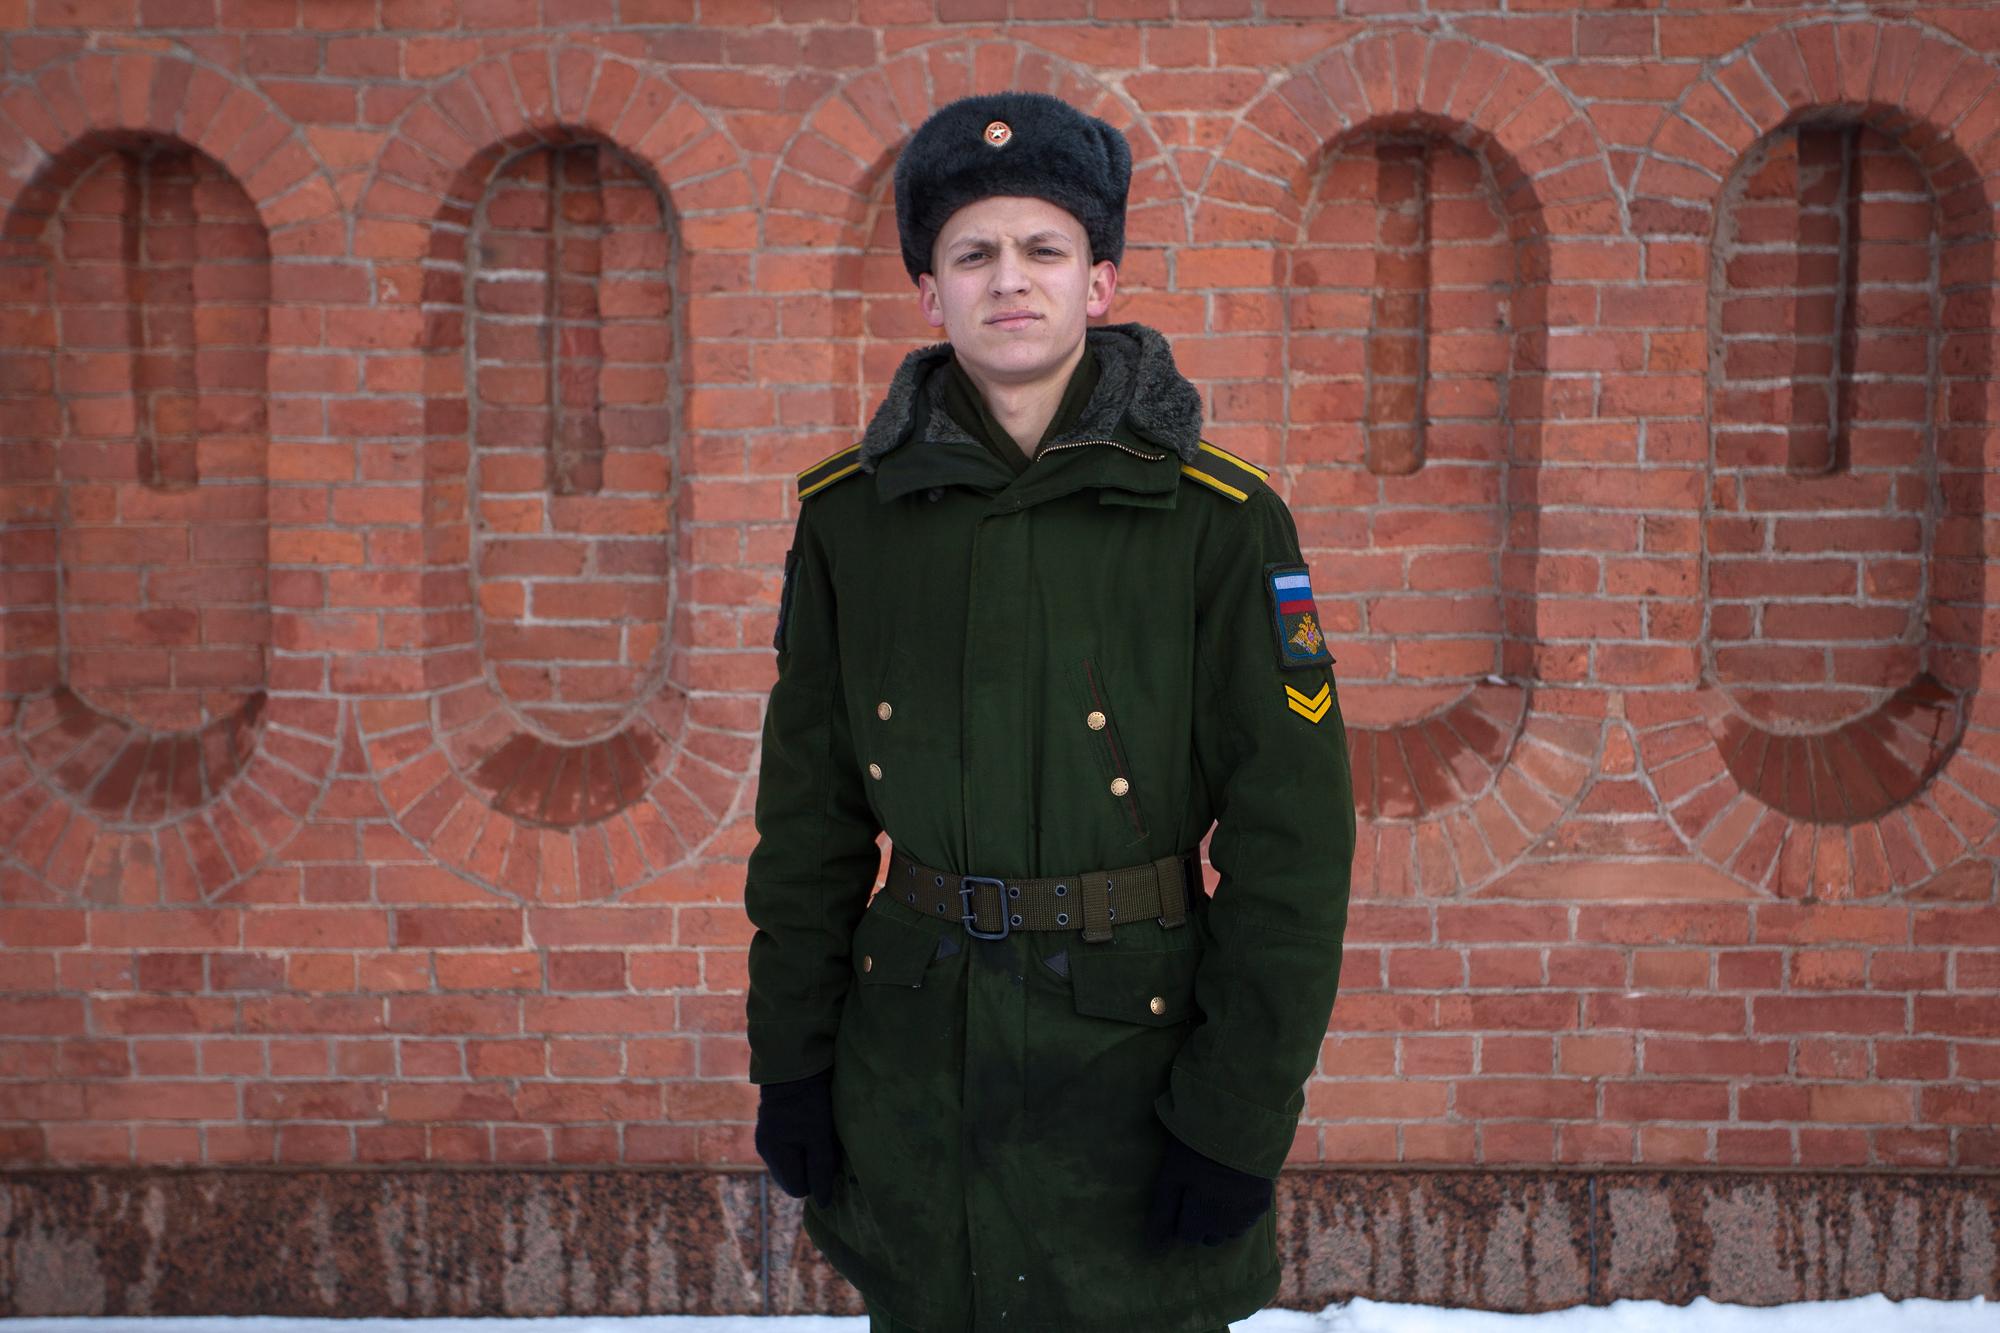 Андрей, 20 лет, курсант